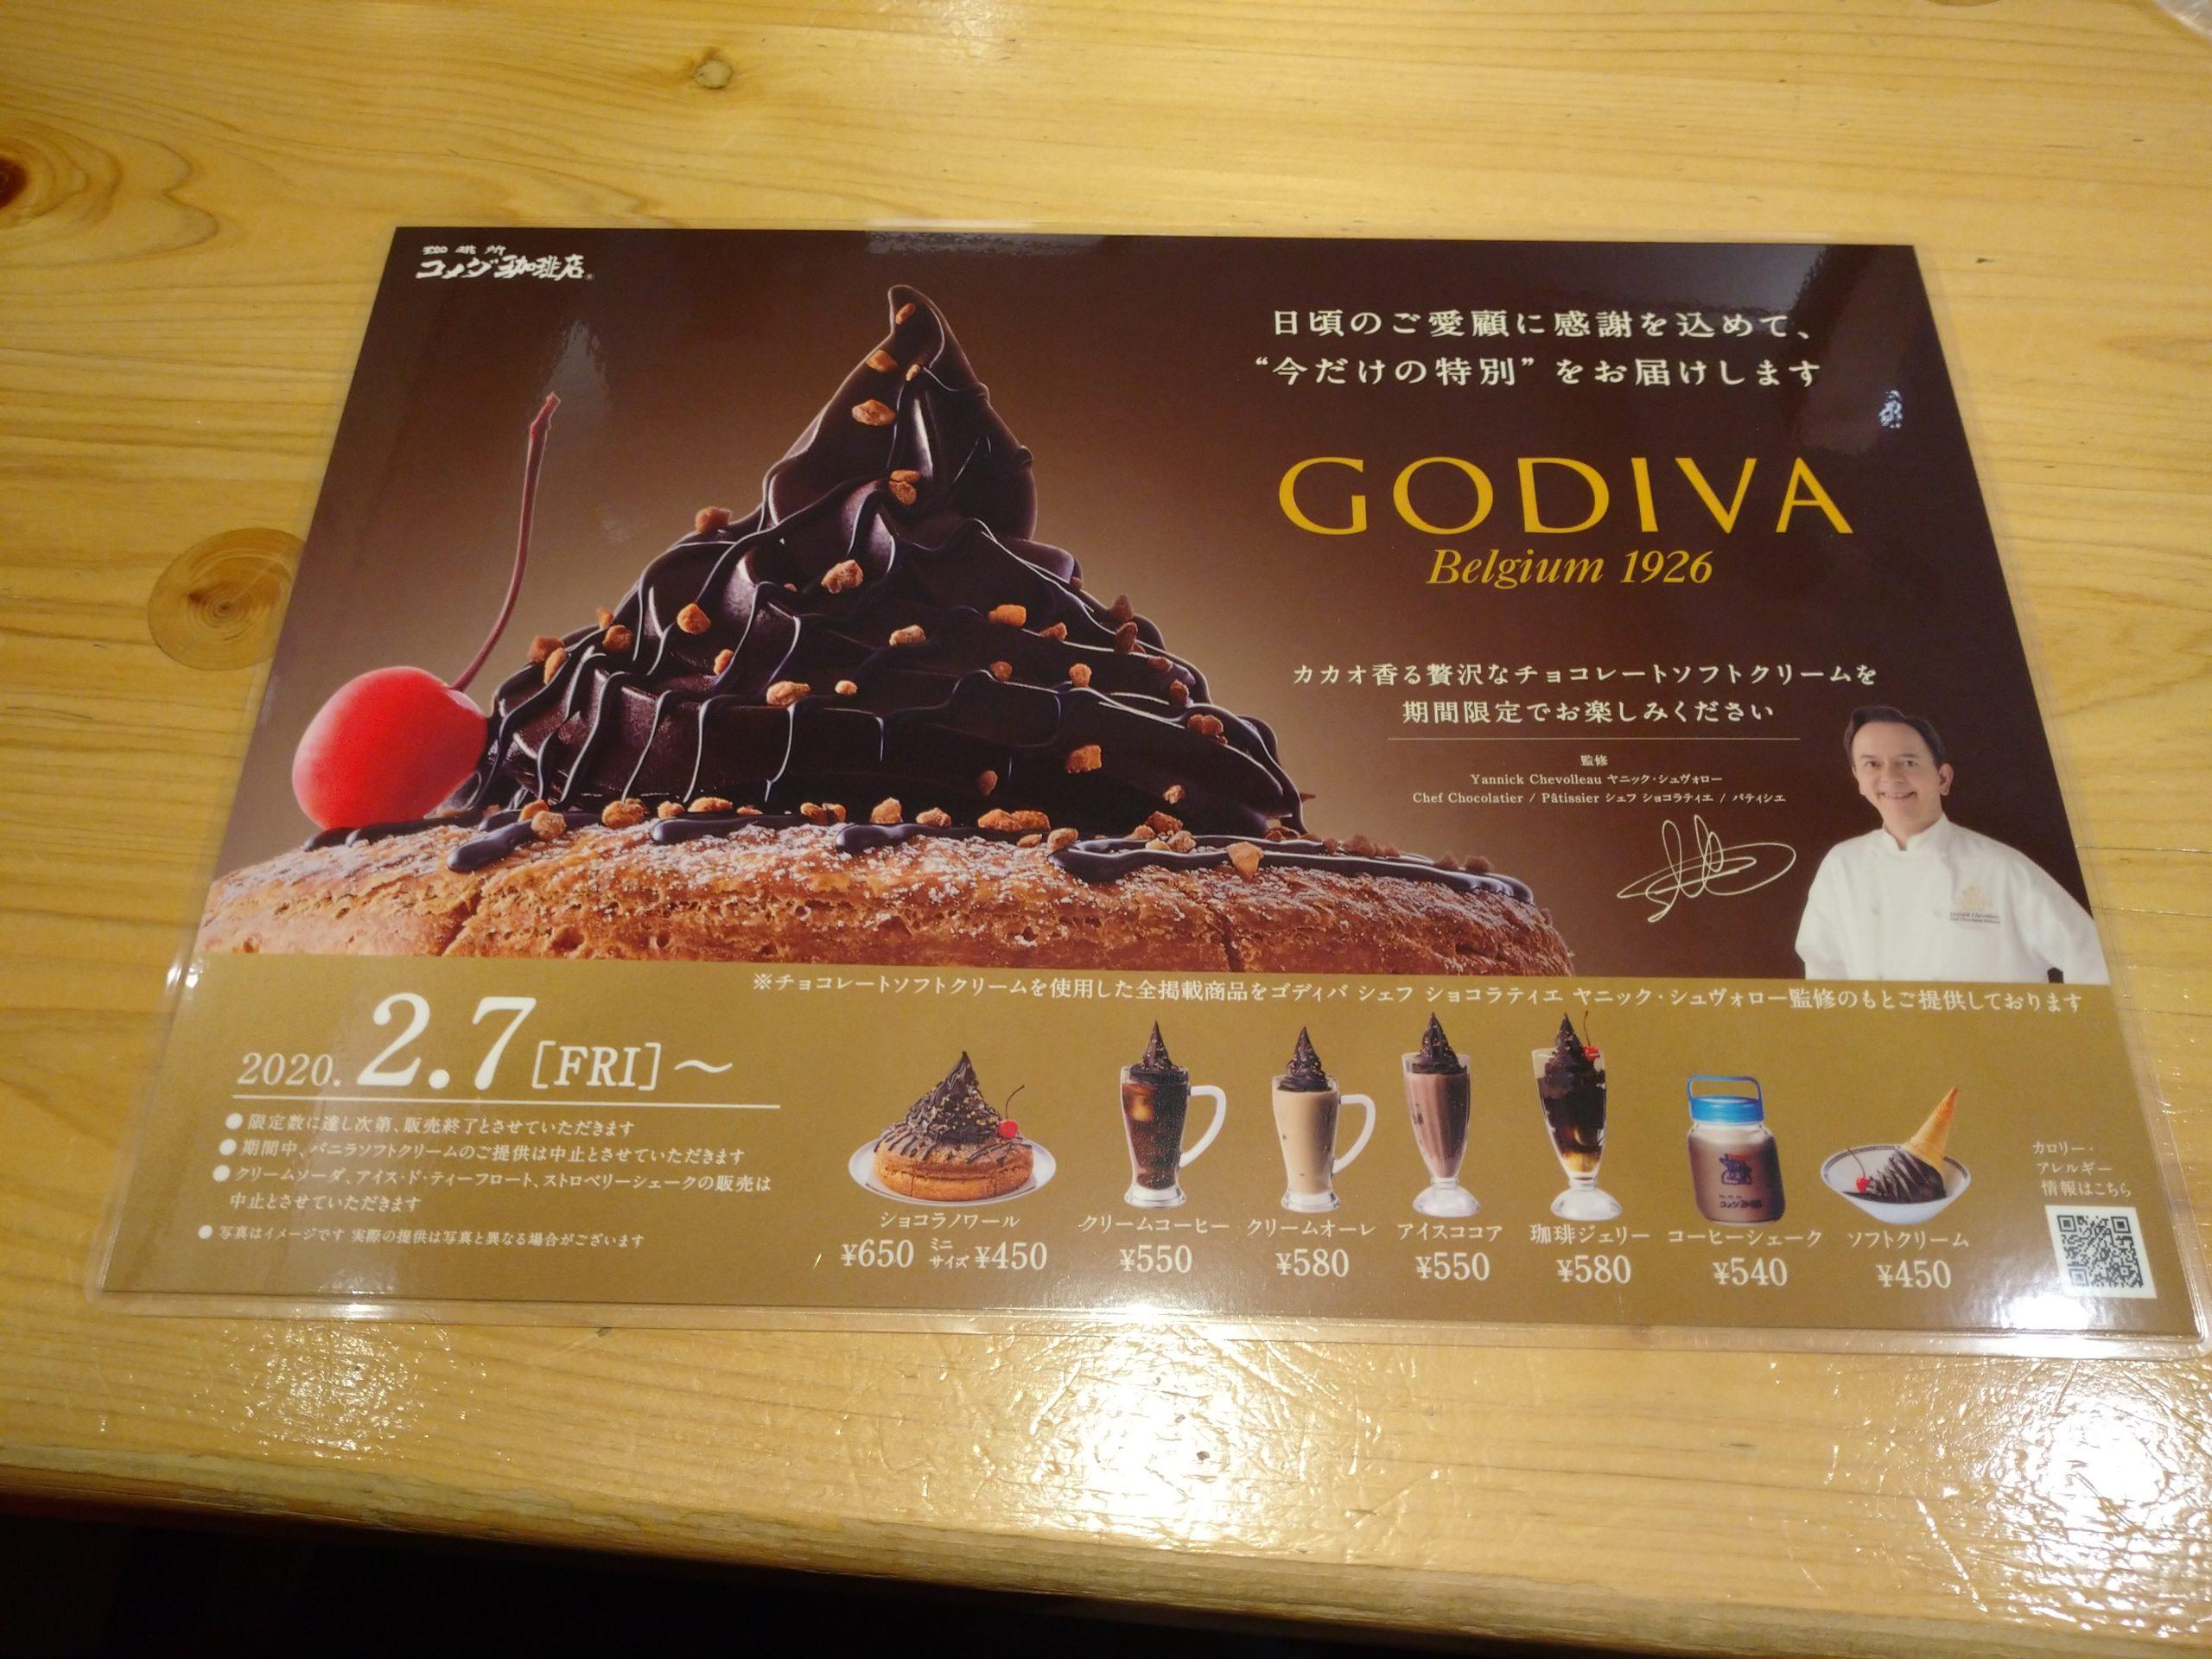 Godiva コメダ 【実食レポ】コメダがGODIVAと再コラボ!「クロネージュ リッチショコラ」を食べてみた